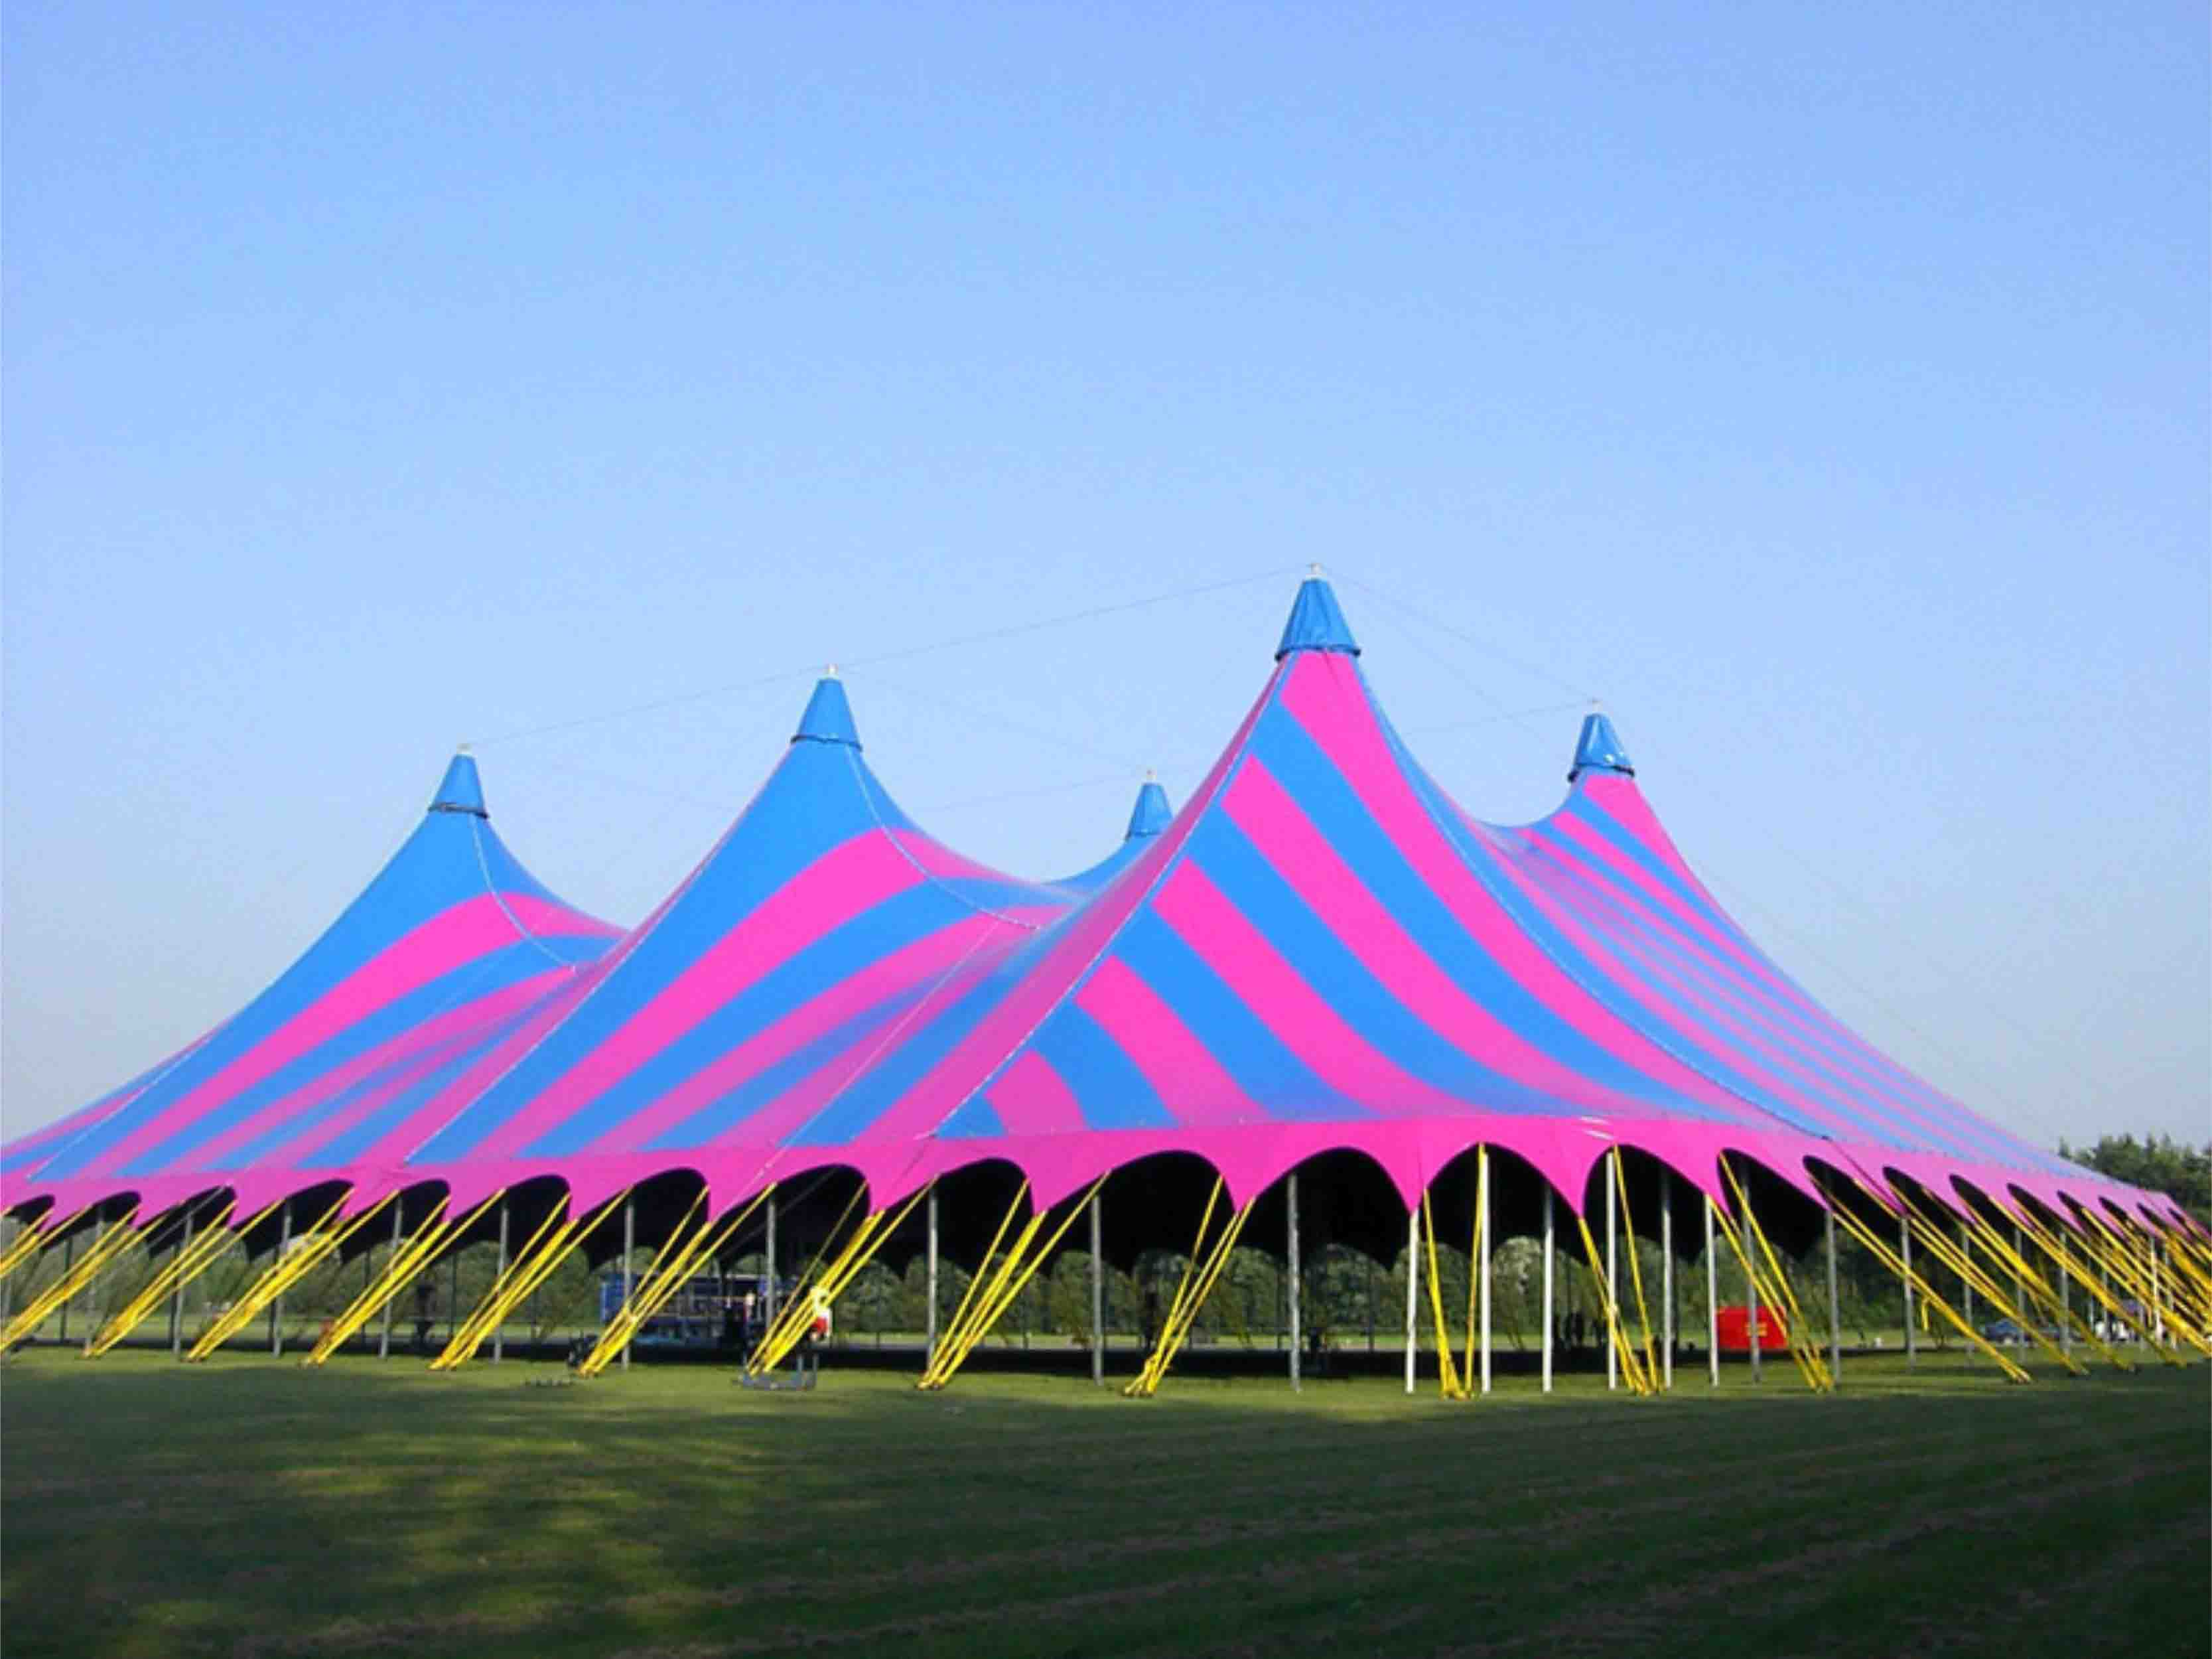 FileAlpine tent-4.jpg & File:Alpine tent-4.jpg - Wikimedia Commons